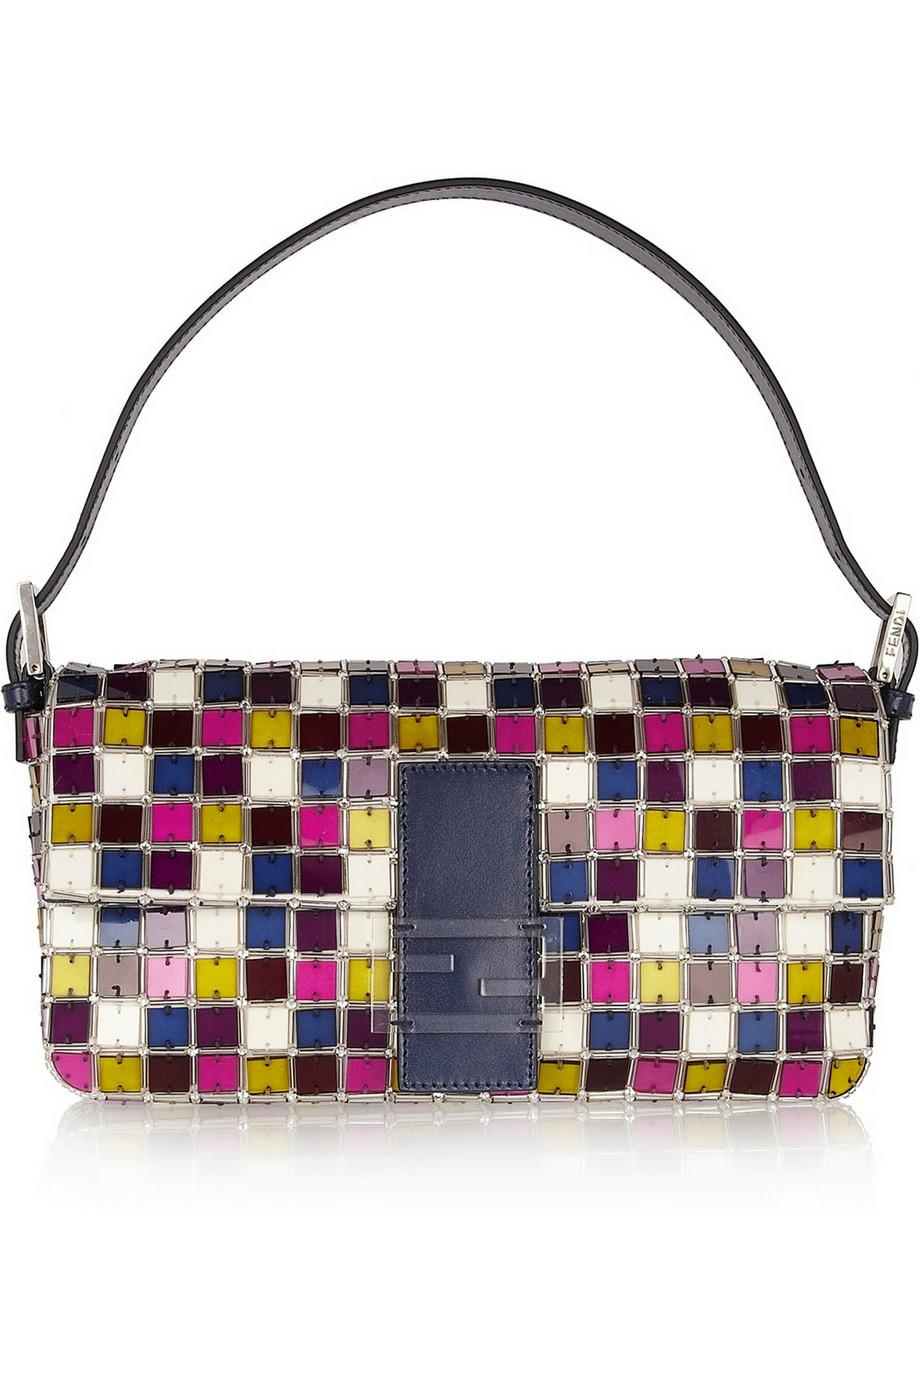 Осенне-зимняя коллекция сумок Fendi 2014-2015